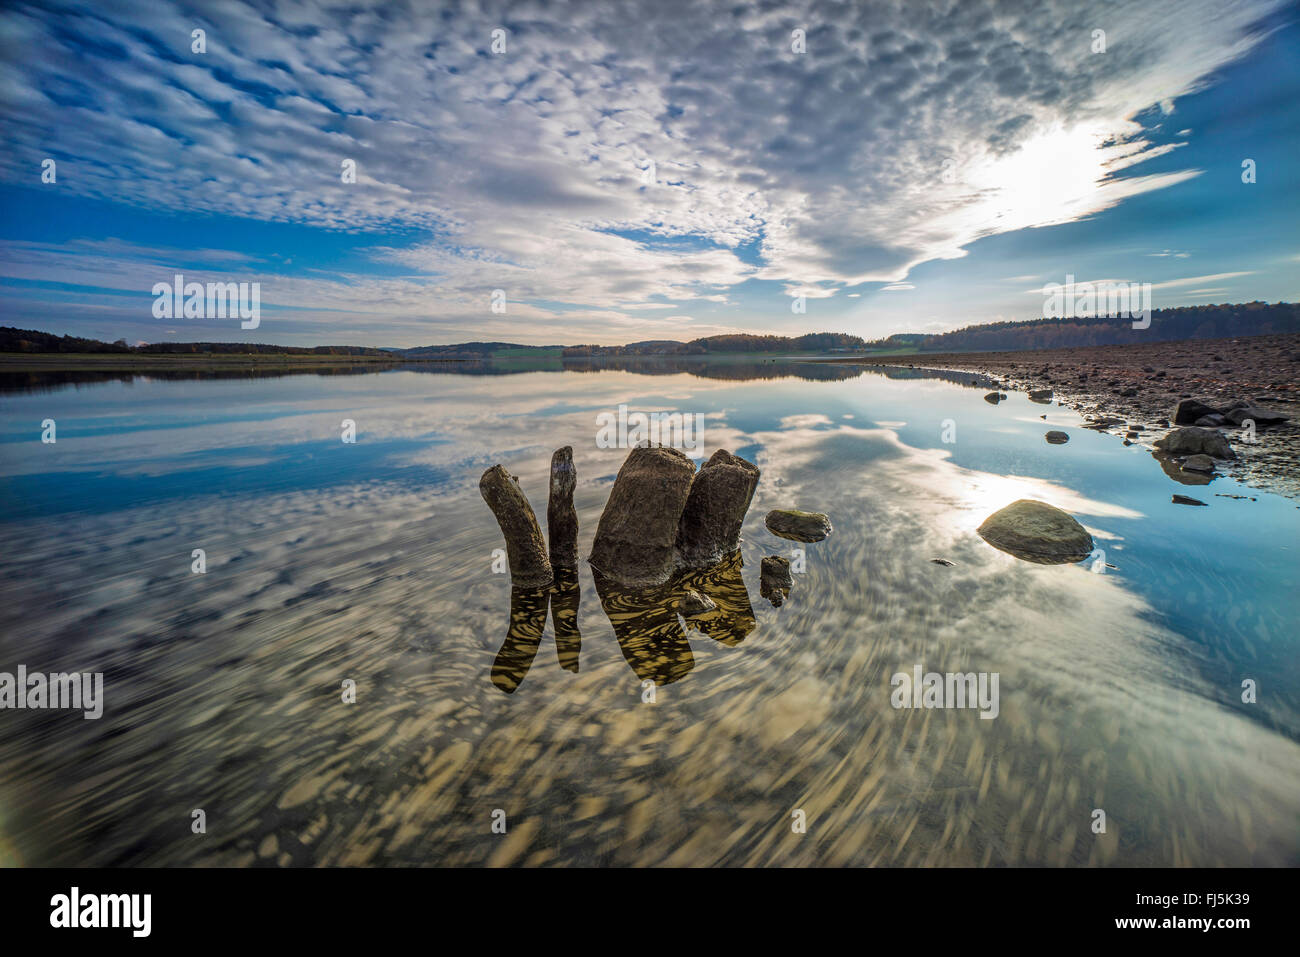 cloud formation over a lake, Germany, Saxony, Jocketa, Talsperre Poehl - Stock Image